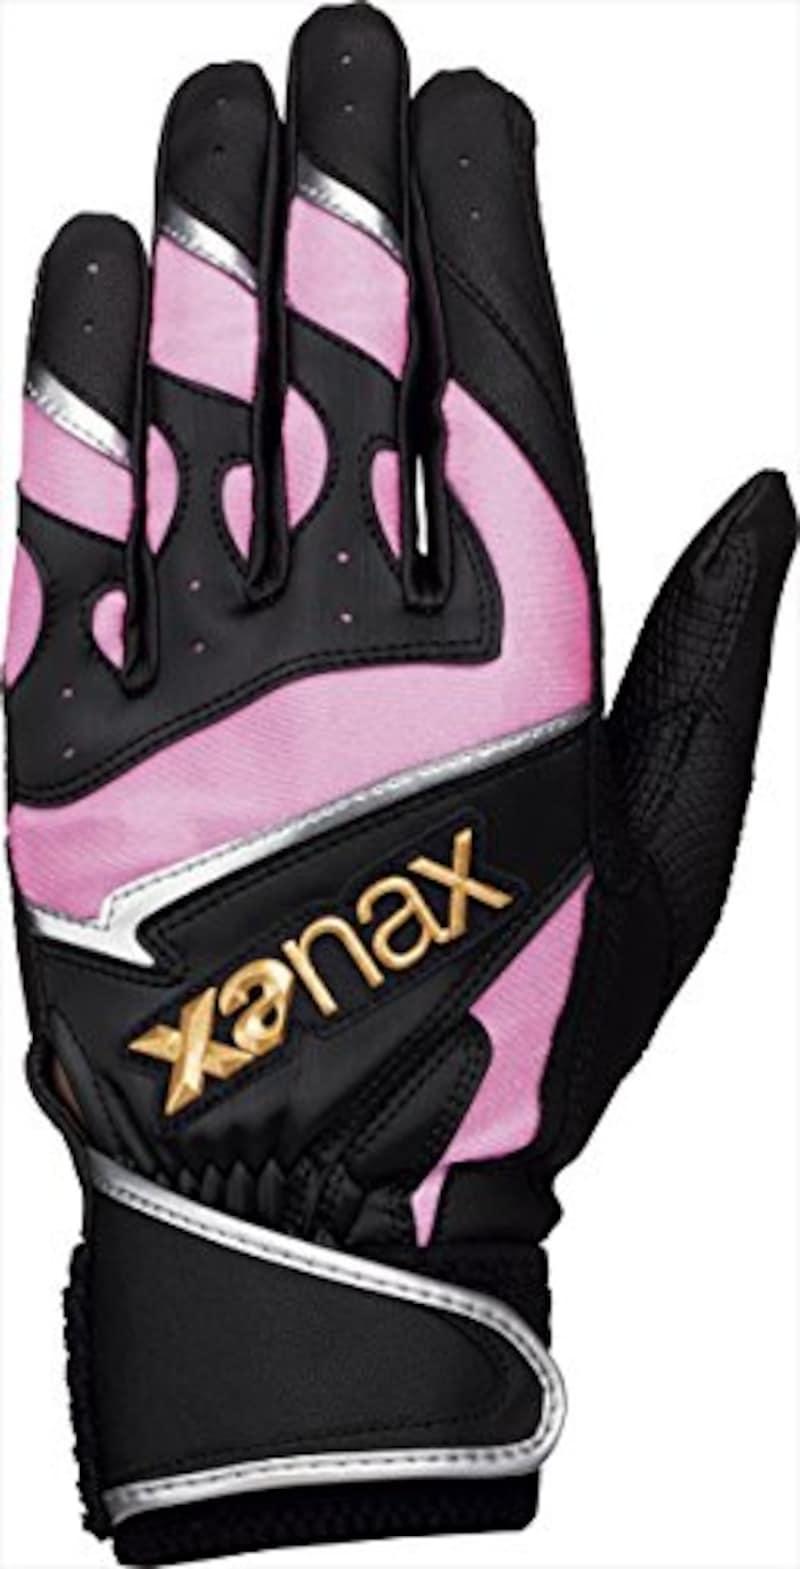 XANAX(ザナックス) バッティング手袋 両手 BBG-80 S